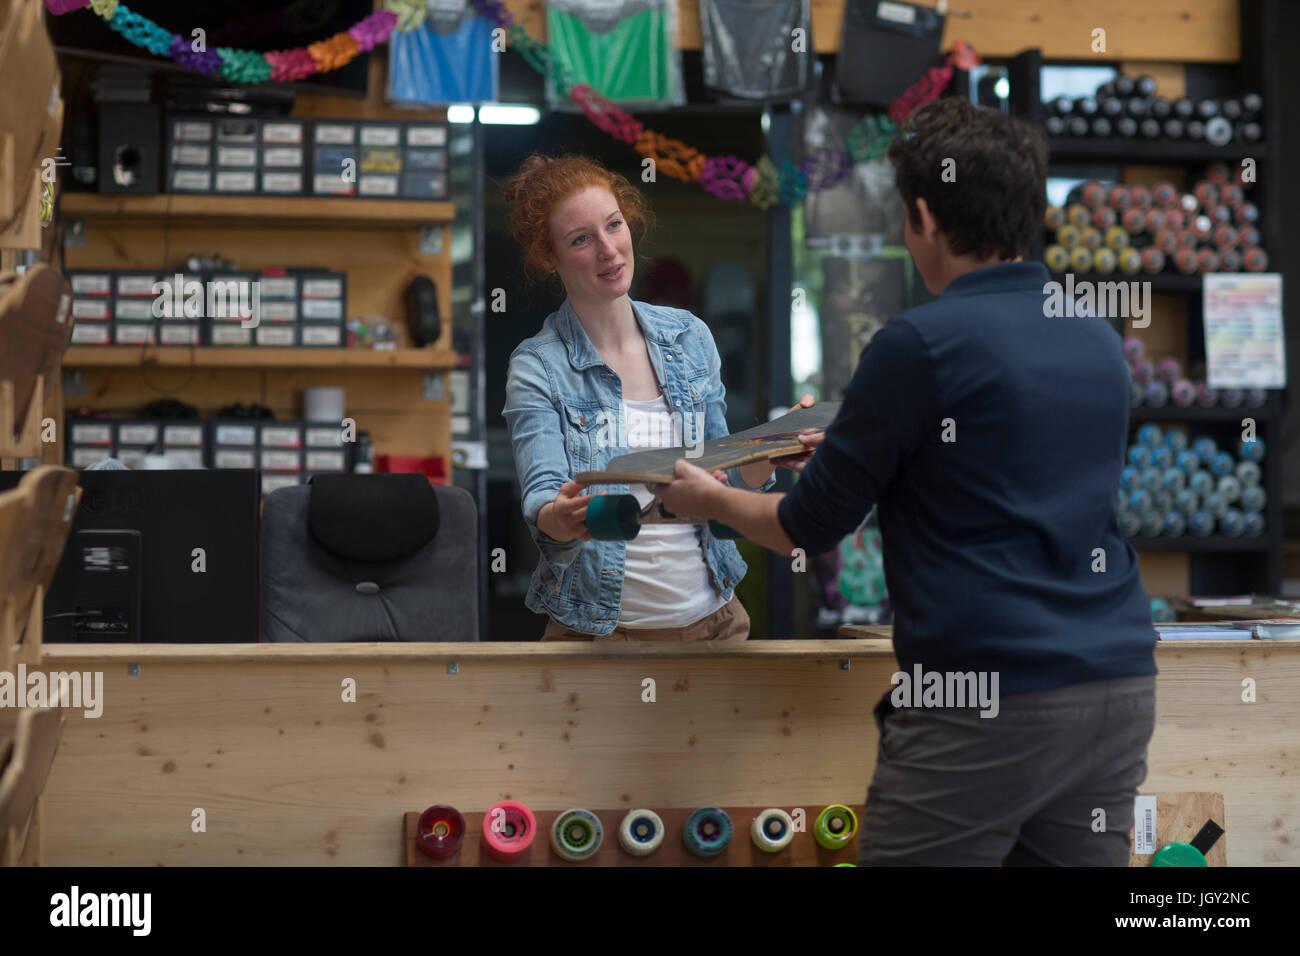 Woman working in skateboard shop, handing skateboard to customer - Stock Image